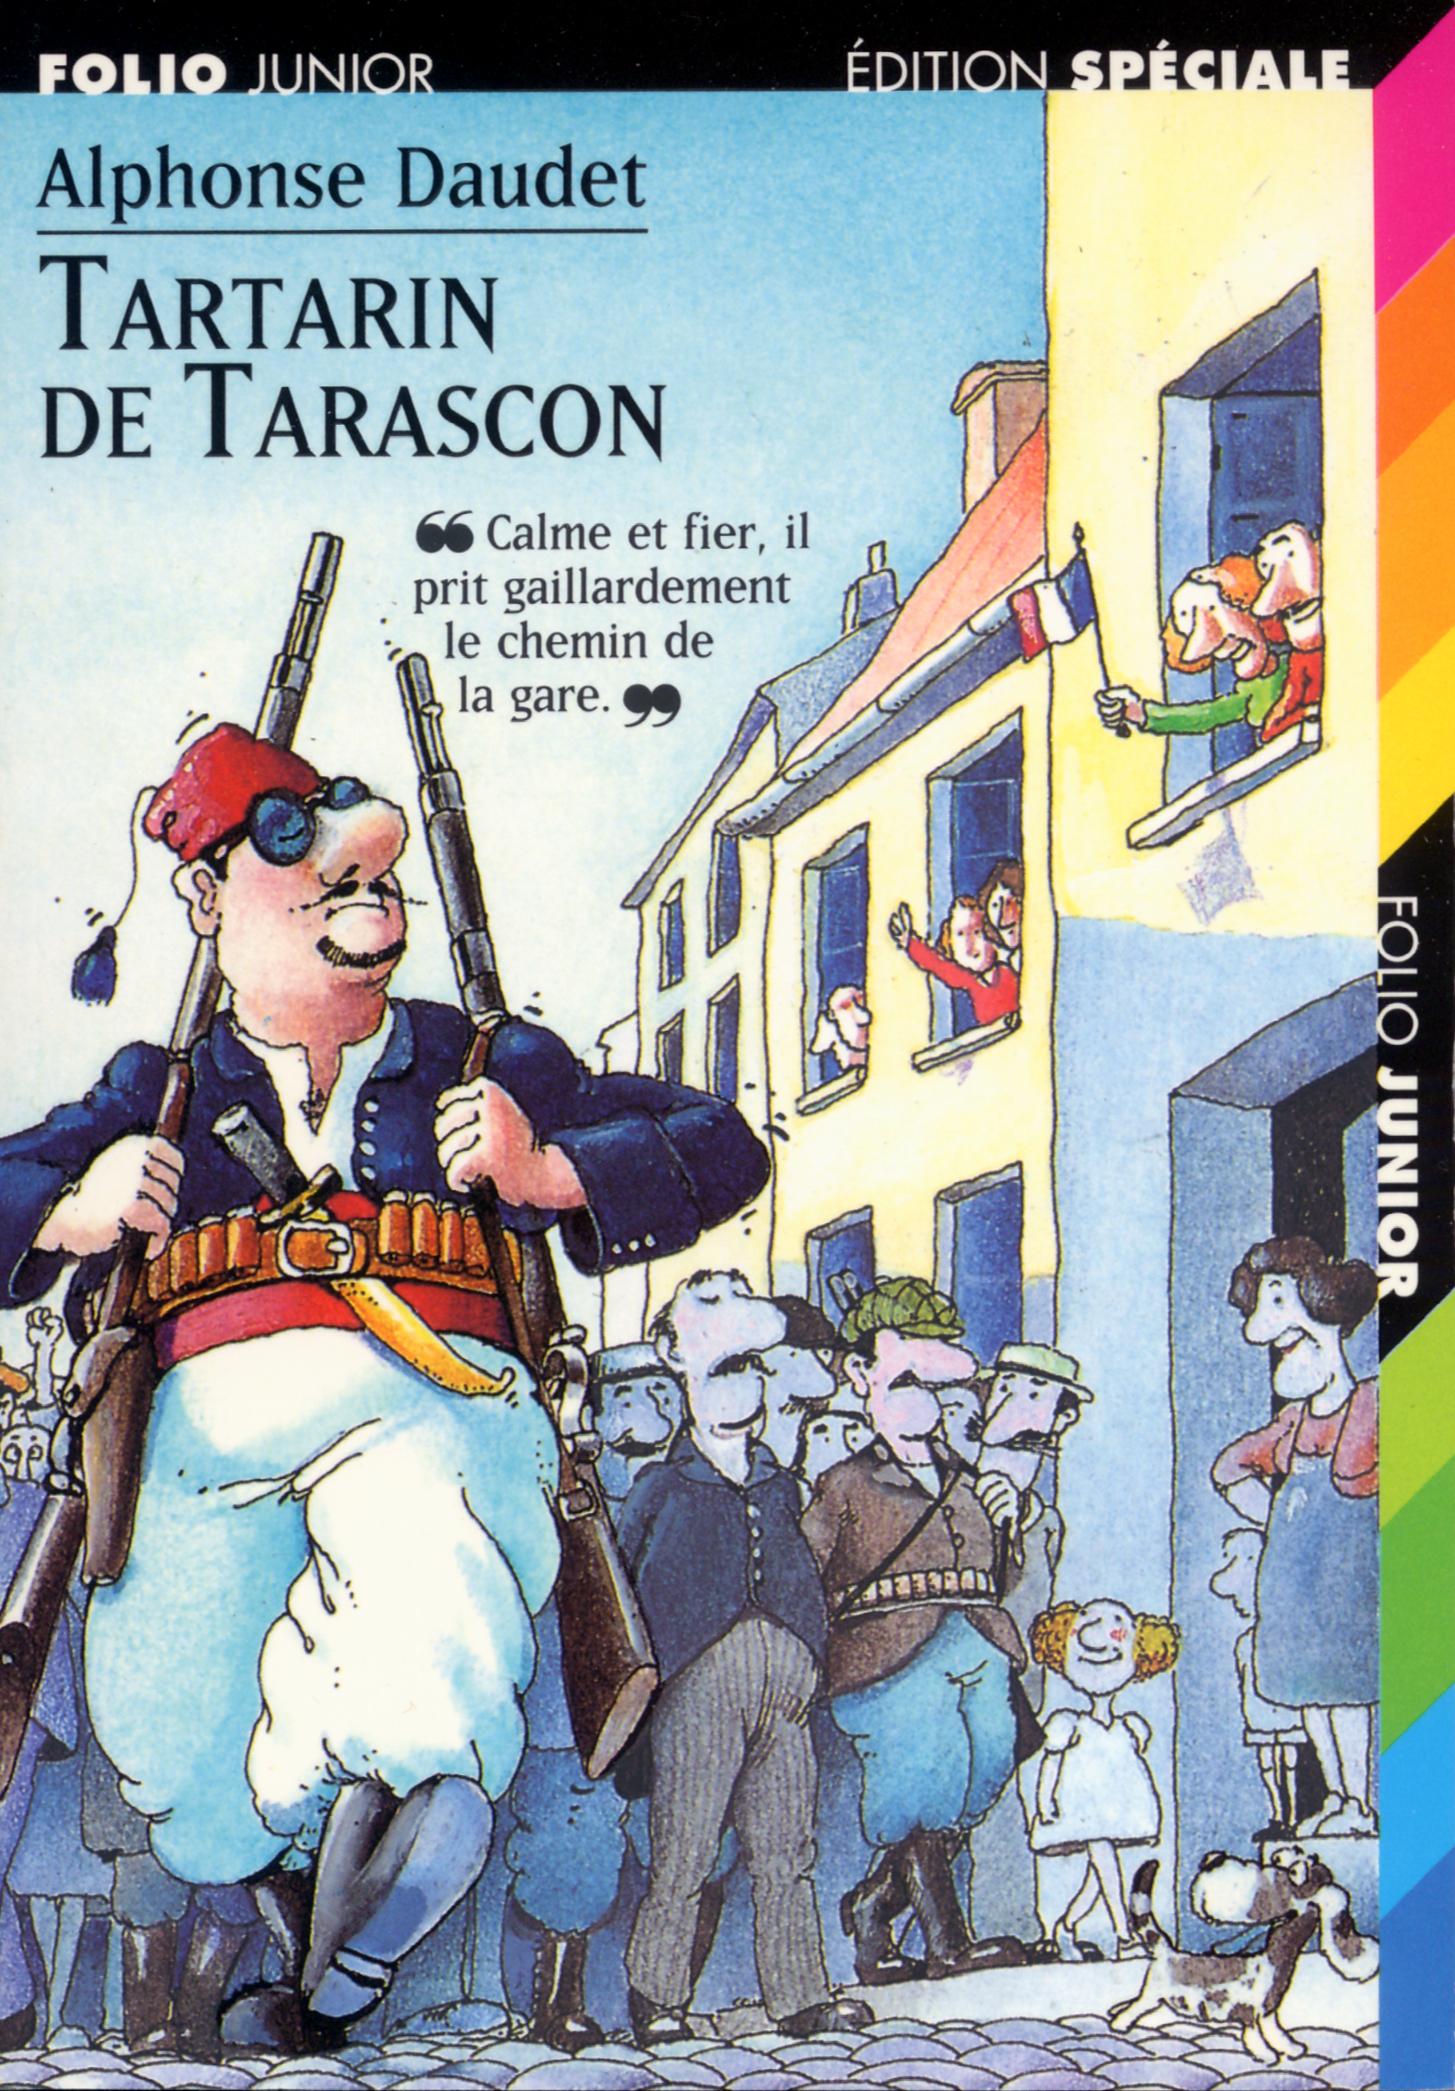 TARASCON TÉLÉCHARGER DE FILM TARTARIN